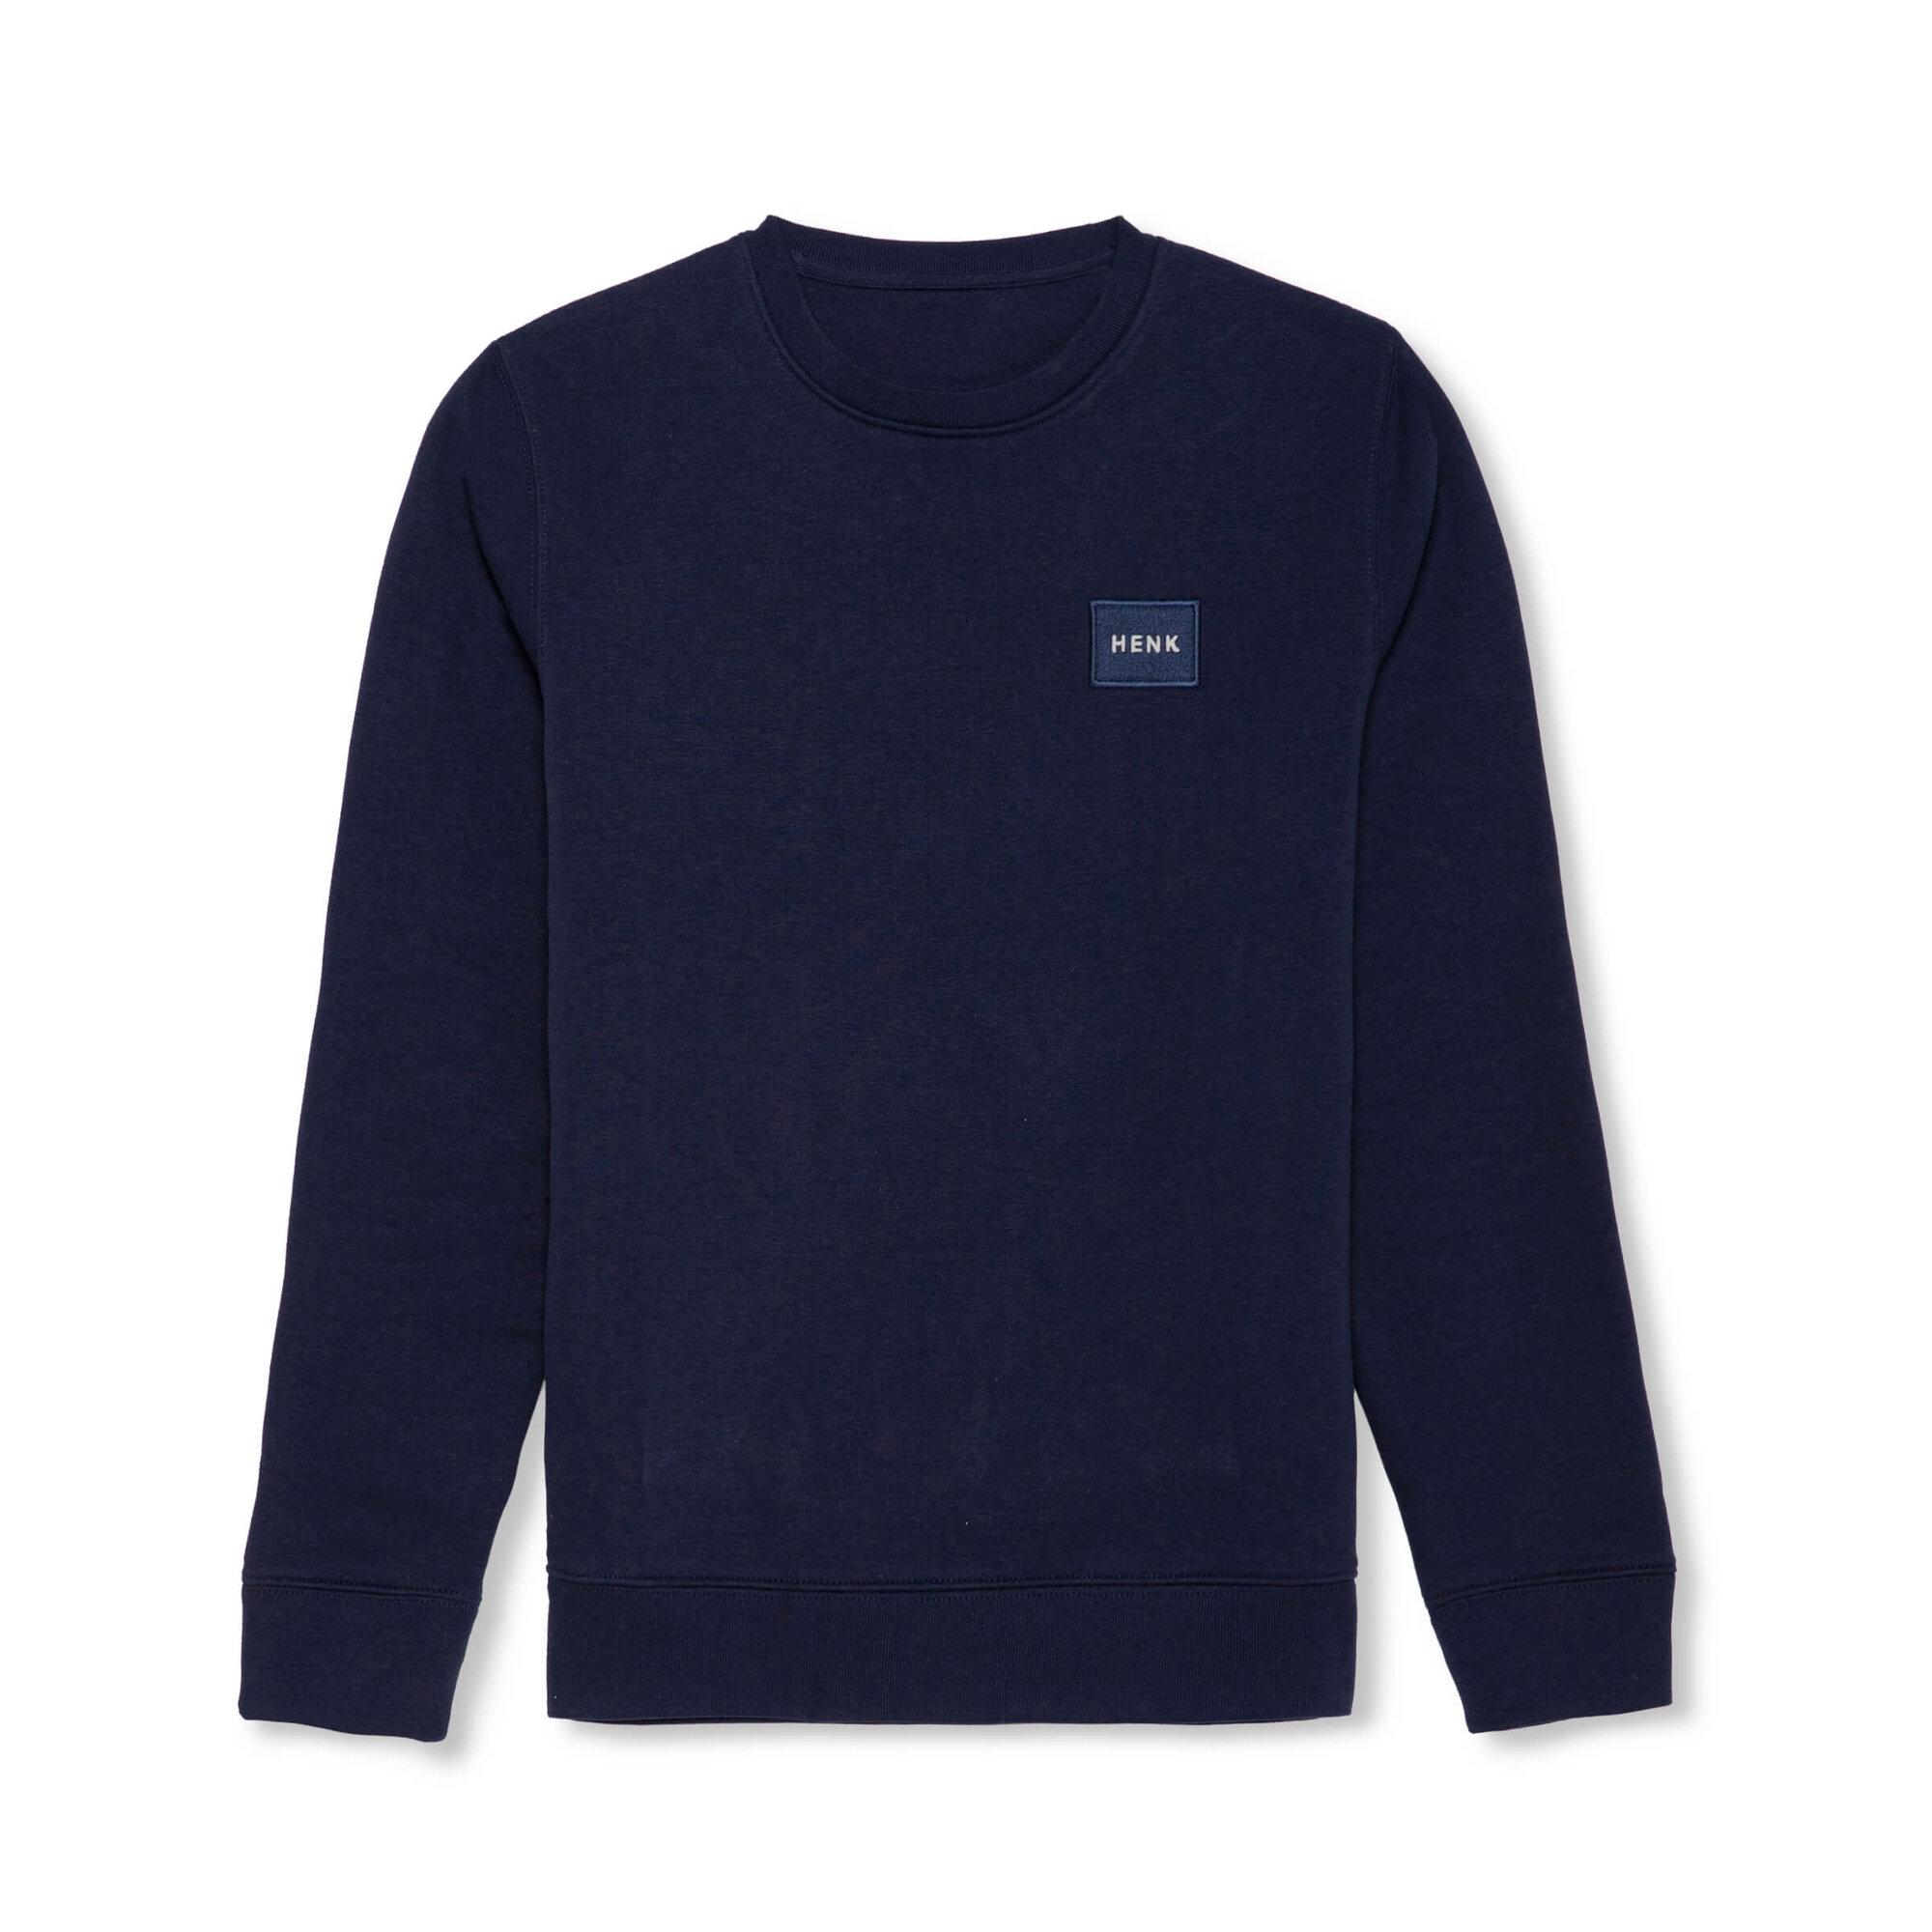 Sweater | Navy | Studio HENK | Listing_image